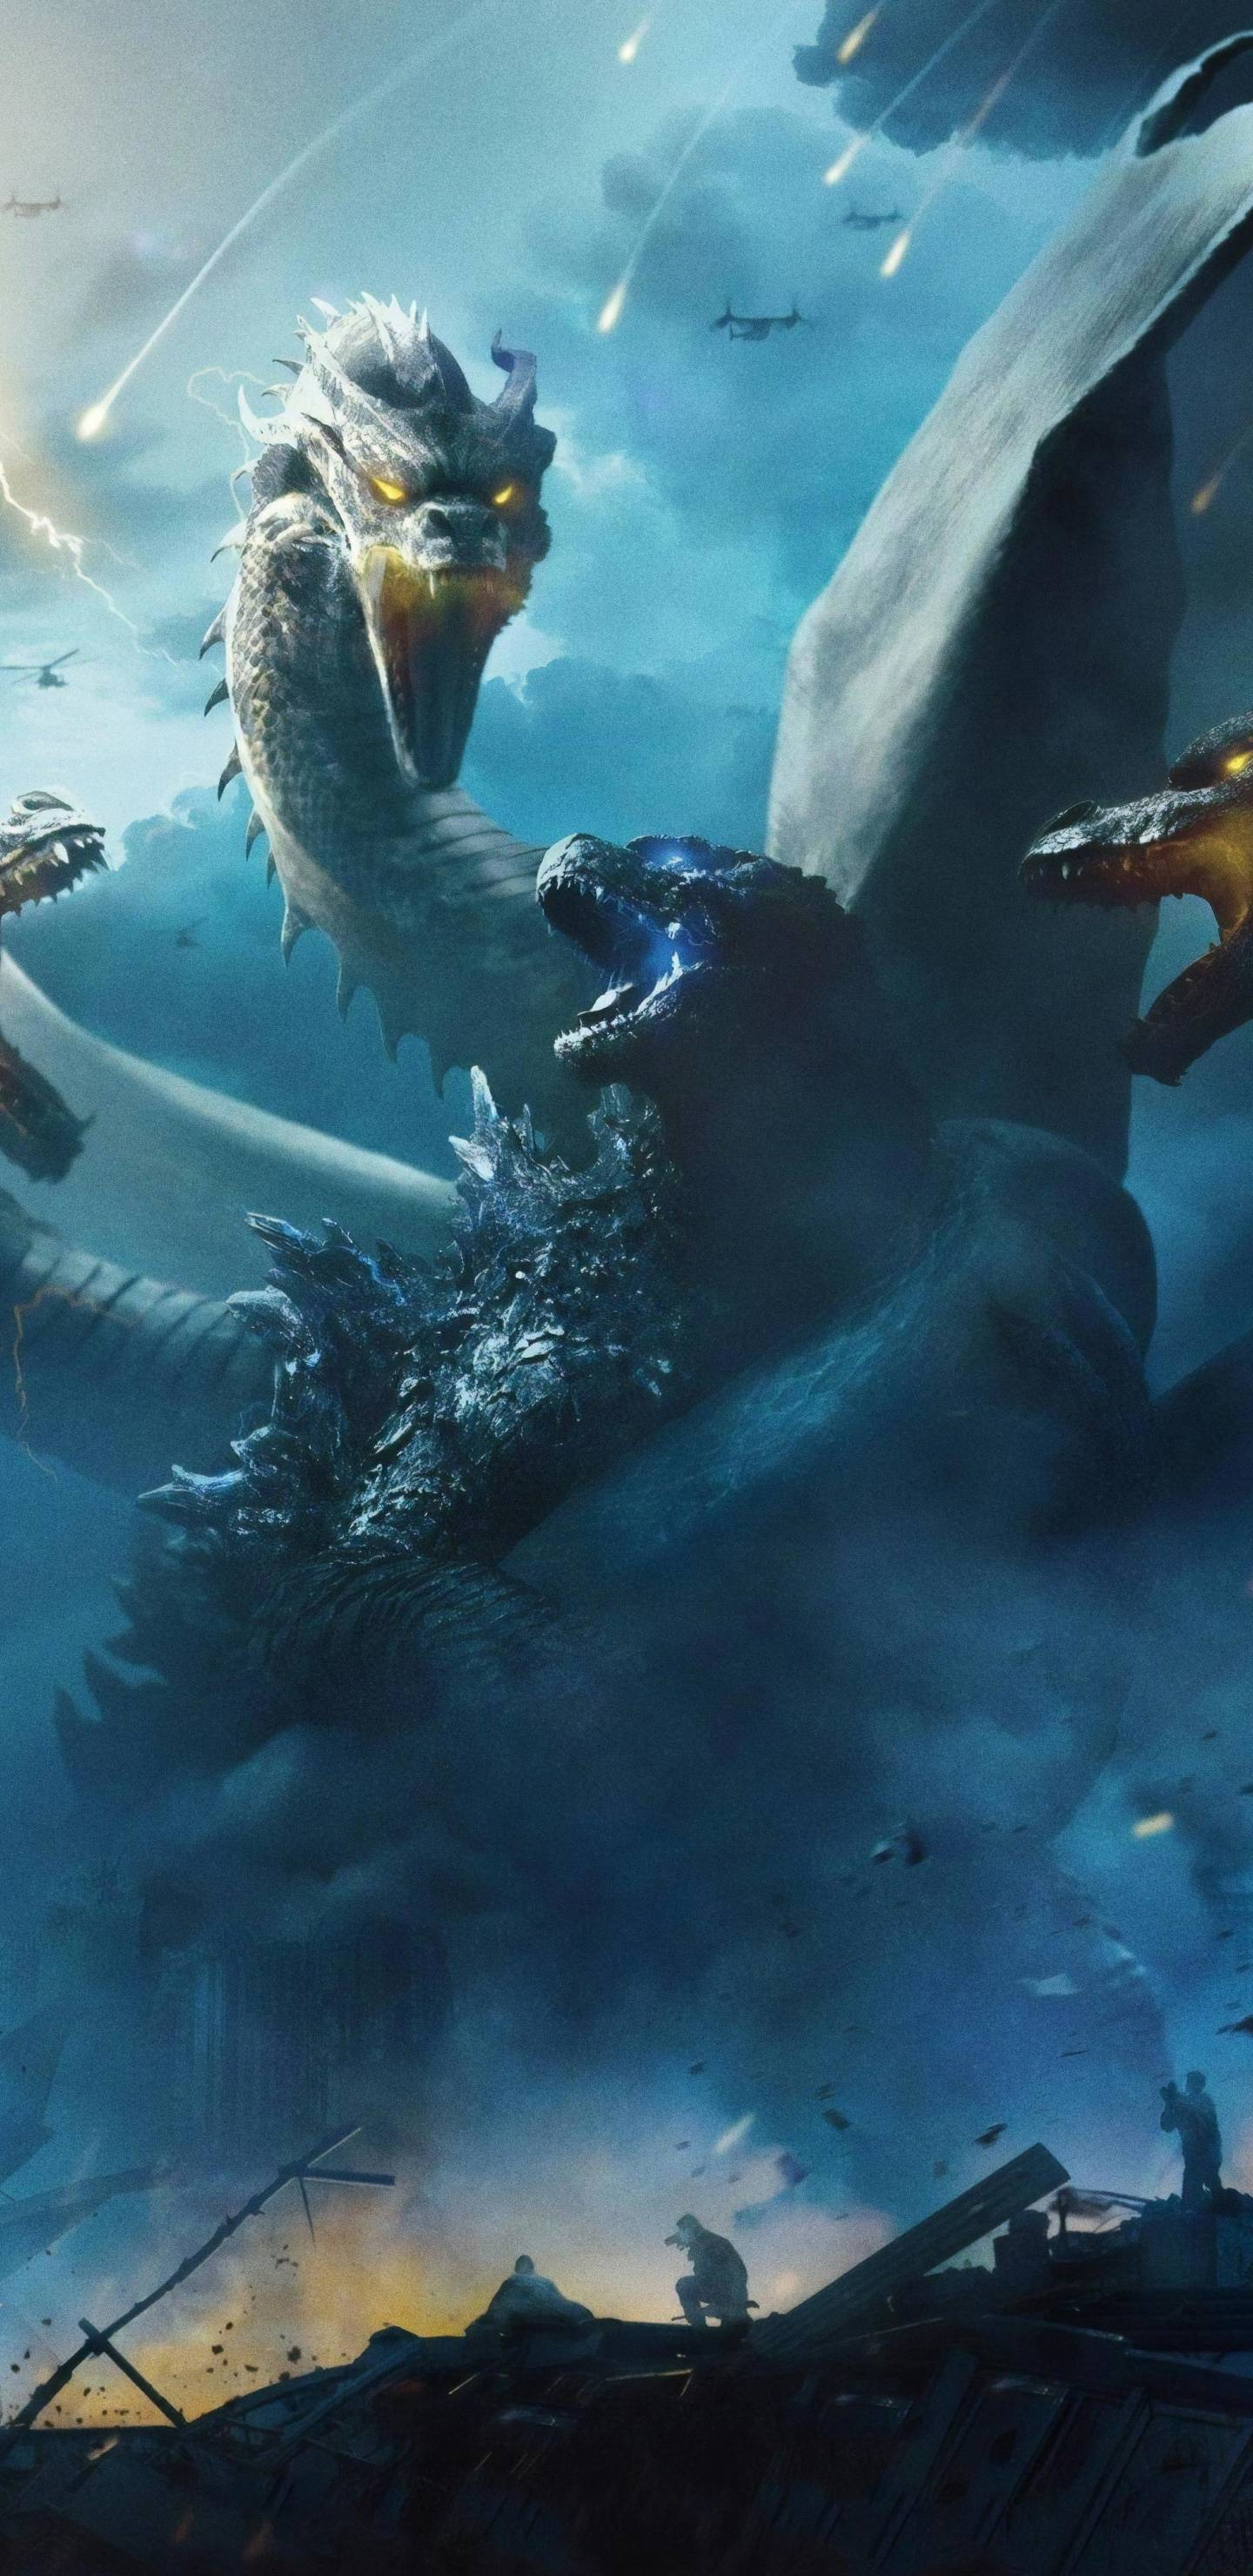 Godzilla 2019 Wallpapers - Wallpaper Cave